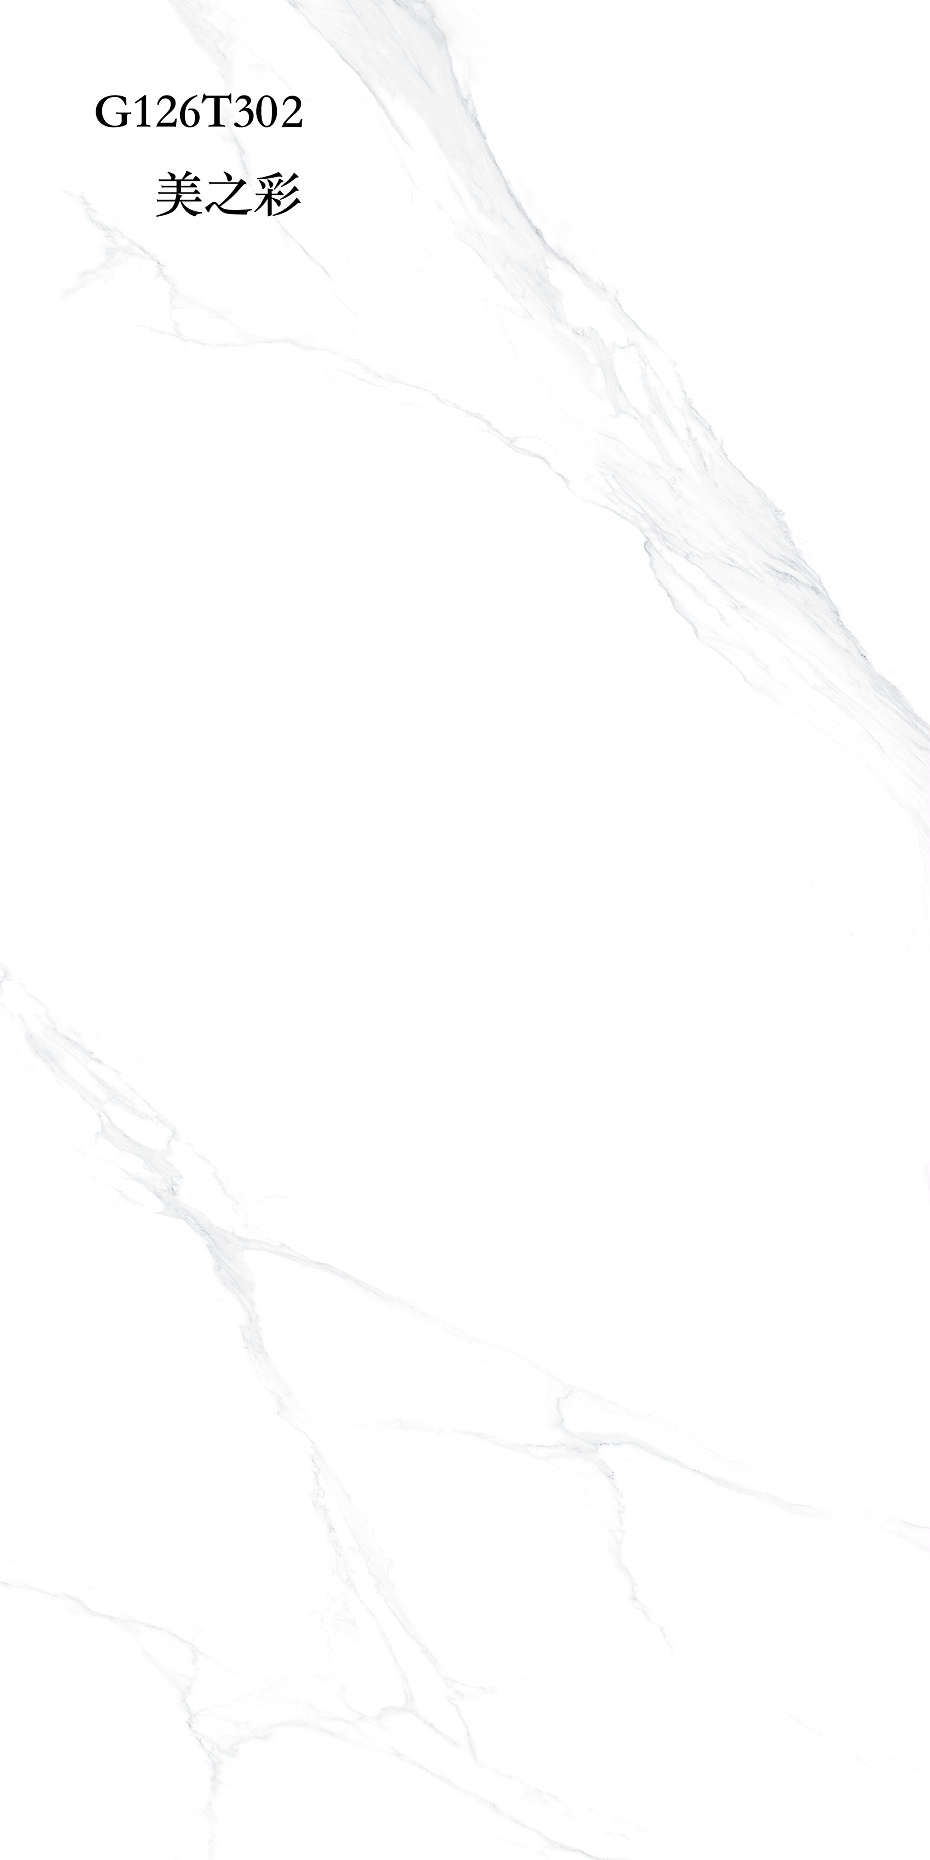 G126T302-